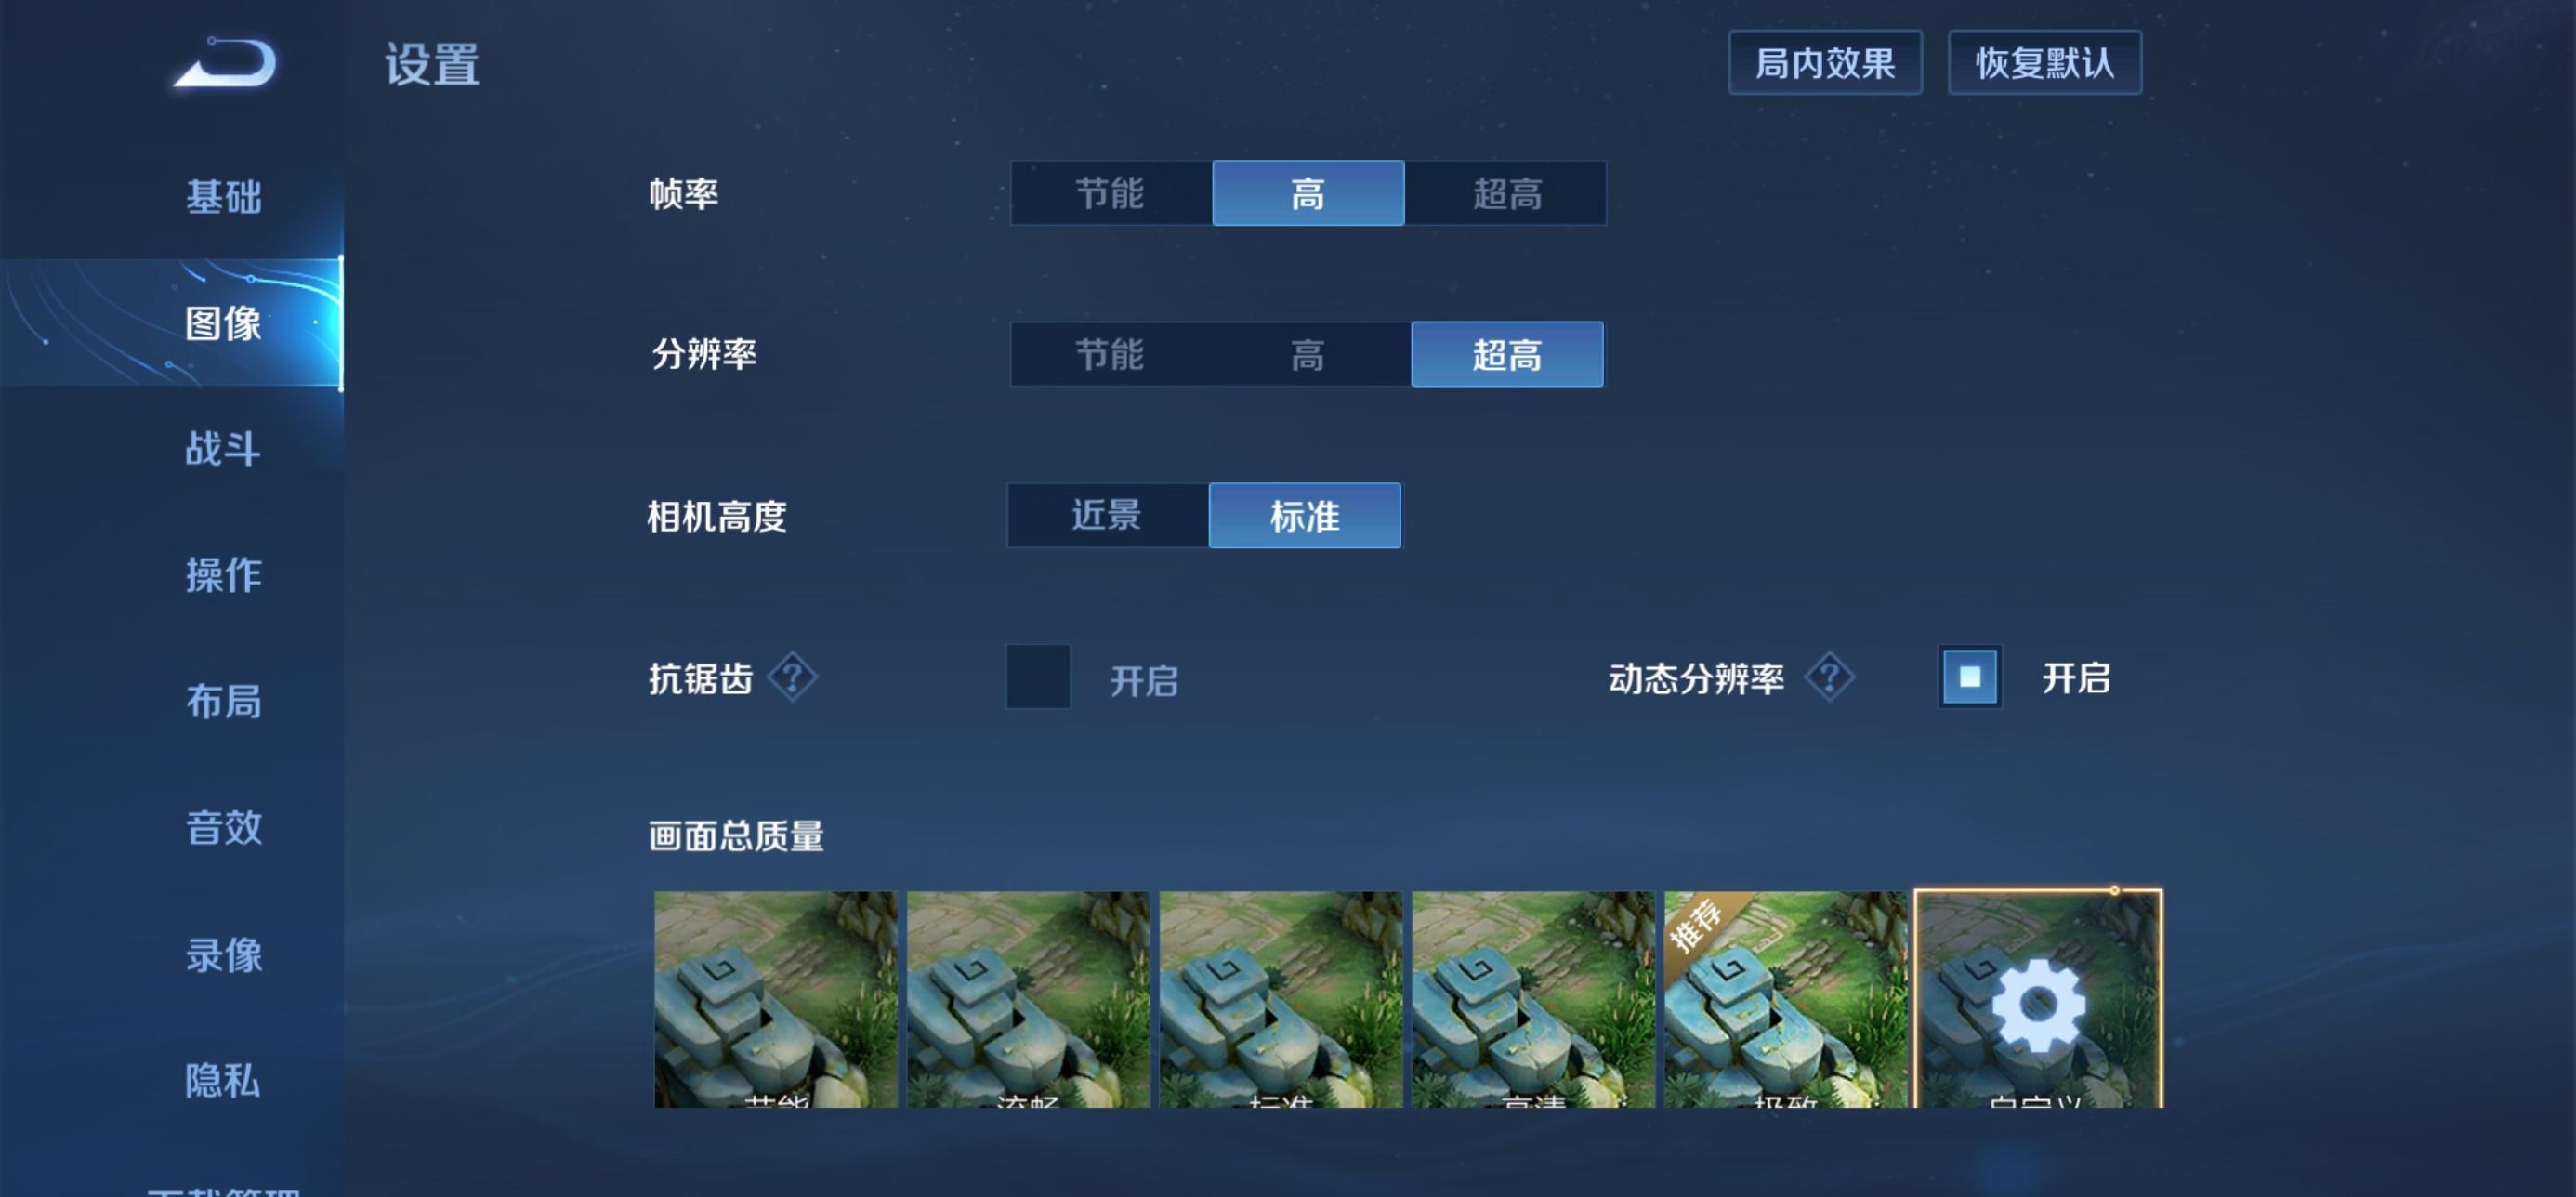 Screenshot_20211013_114904_com.tencent.tmgp.sgame.jpg